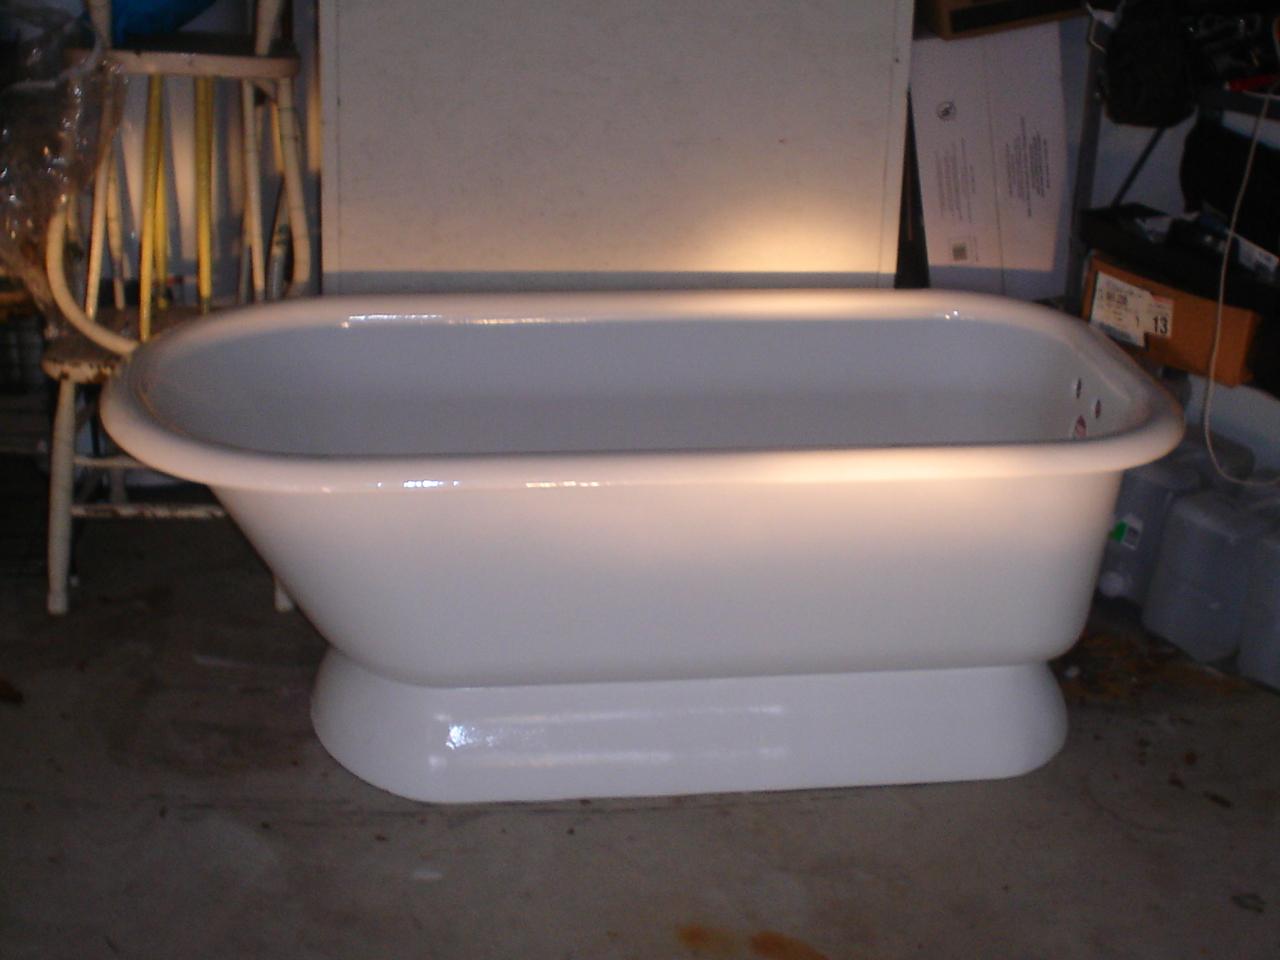 Pedestal Bathtub For Sale 28 Images Pedestal Sink D198 In Goleta Ca Diggerslist Com Acrylic